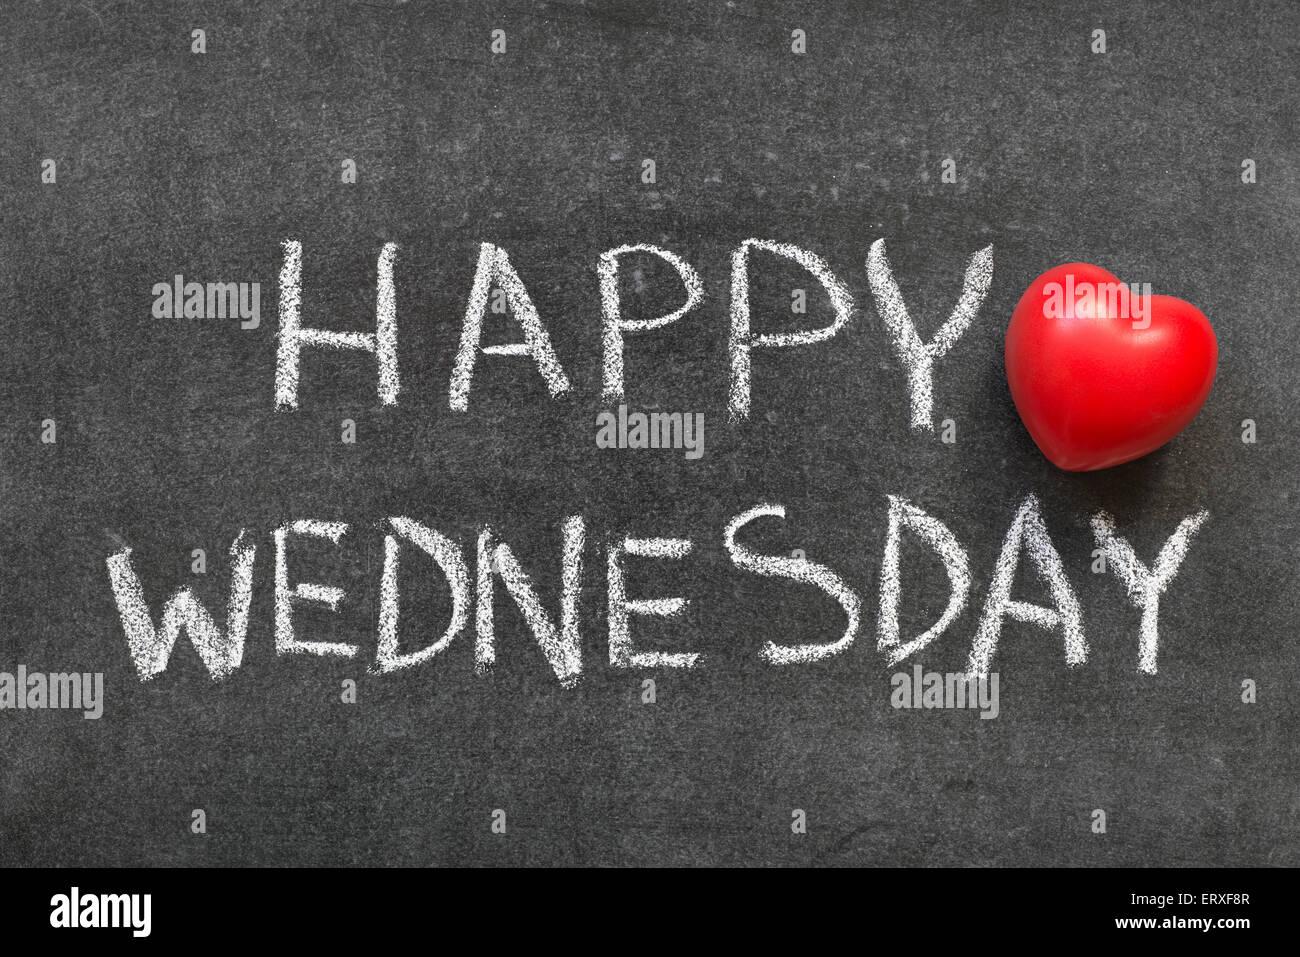 Happy Wednesday Phrase Handwritten On Blackboard With Heart Symbol